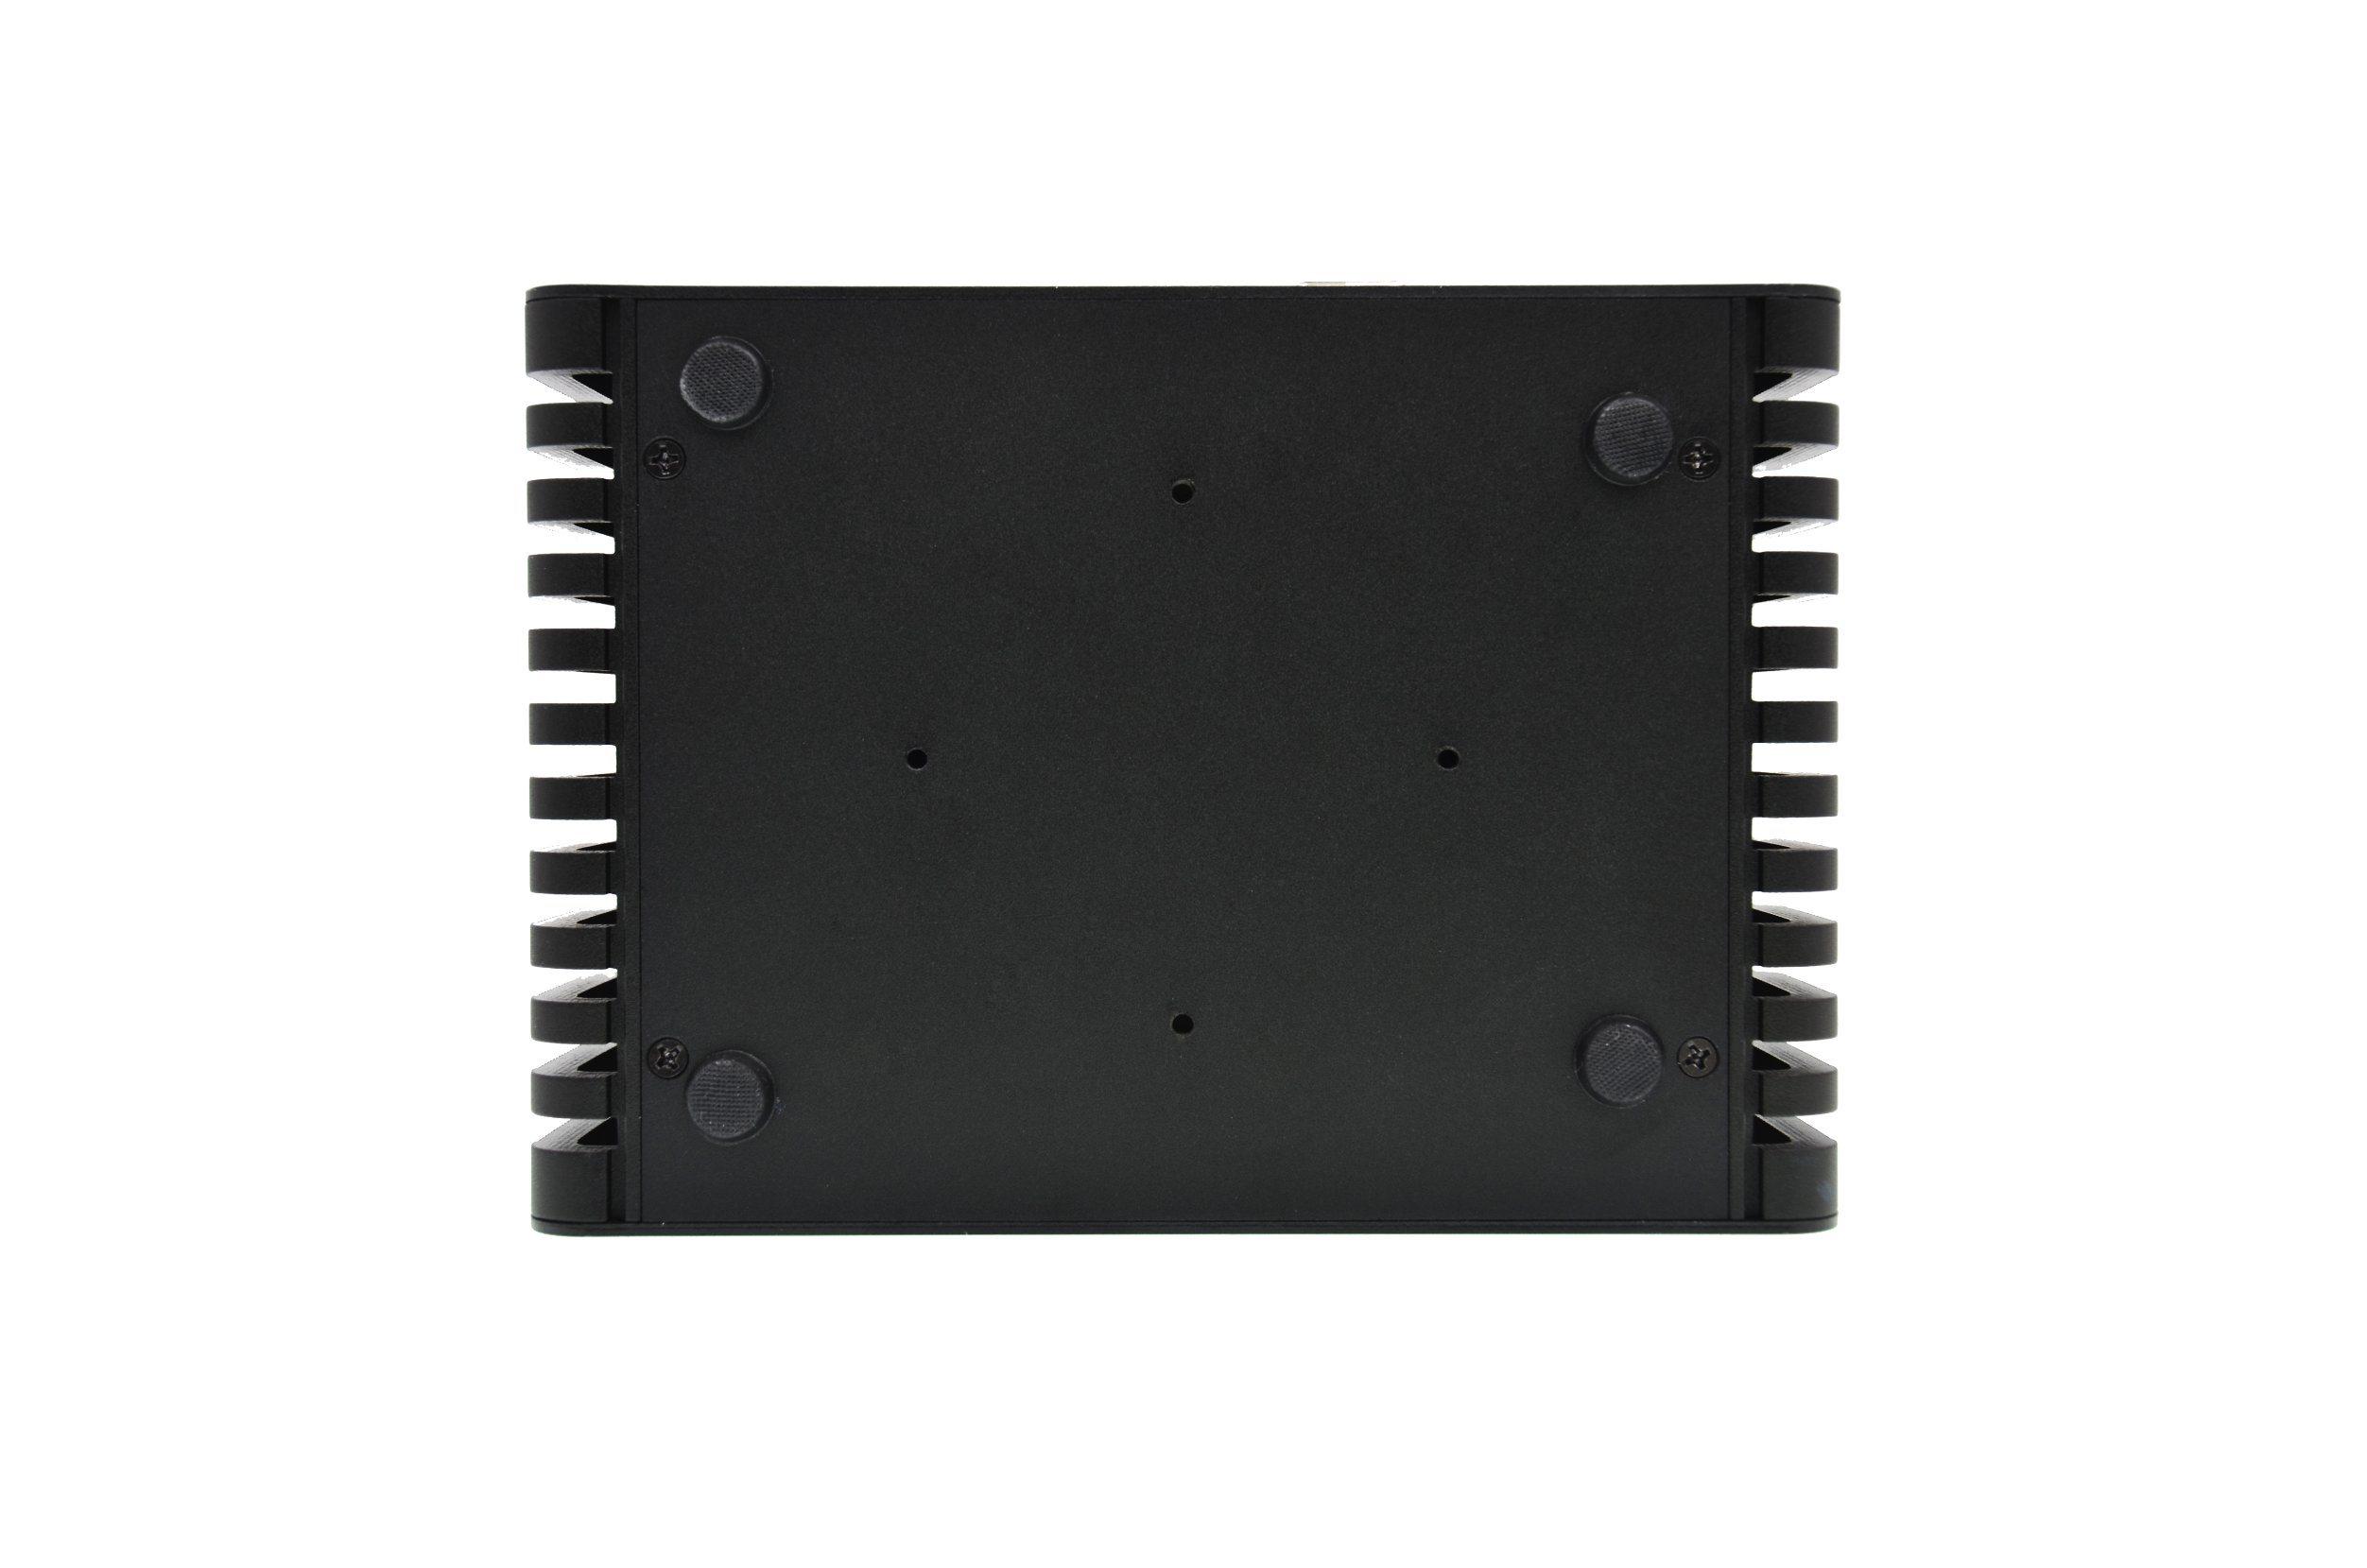 Core I7 4500u Thin Client Mini PC (S5740M)